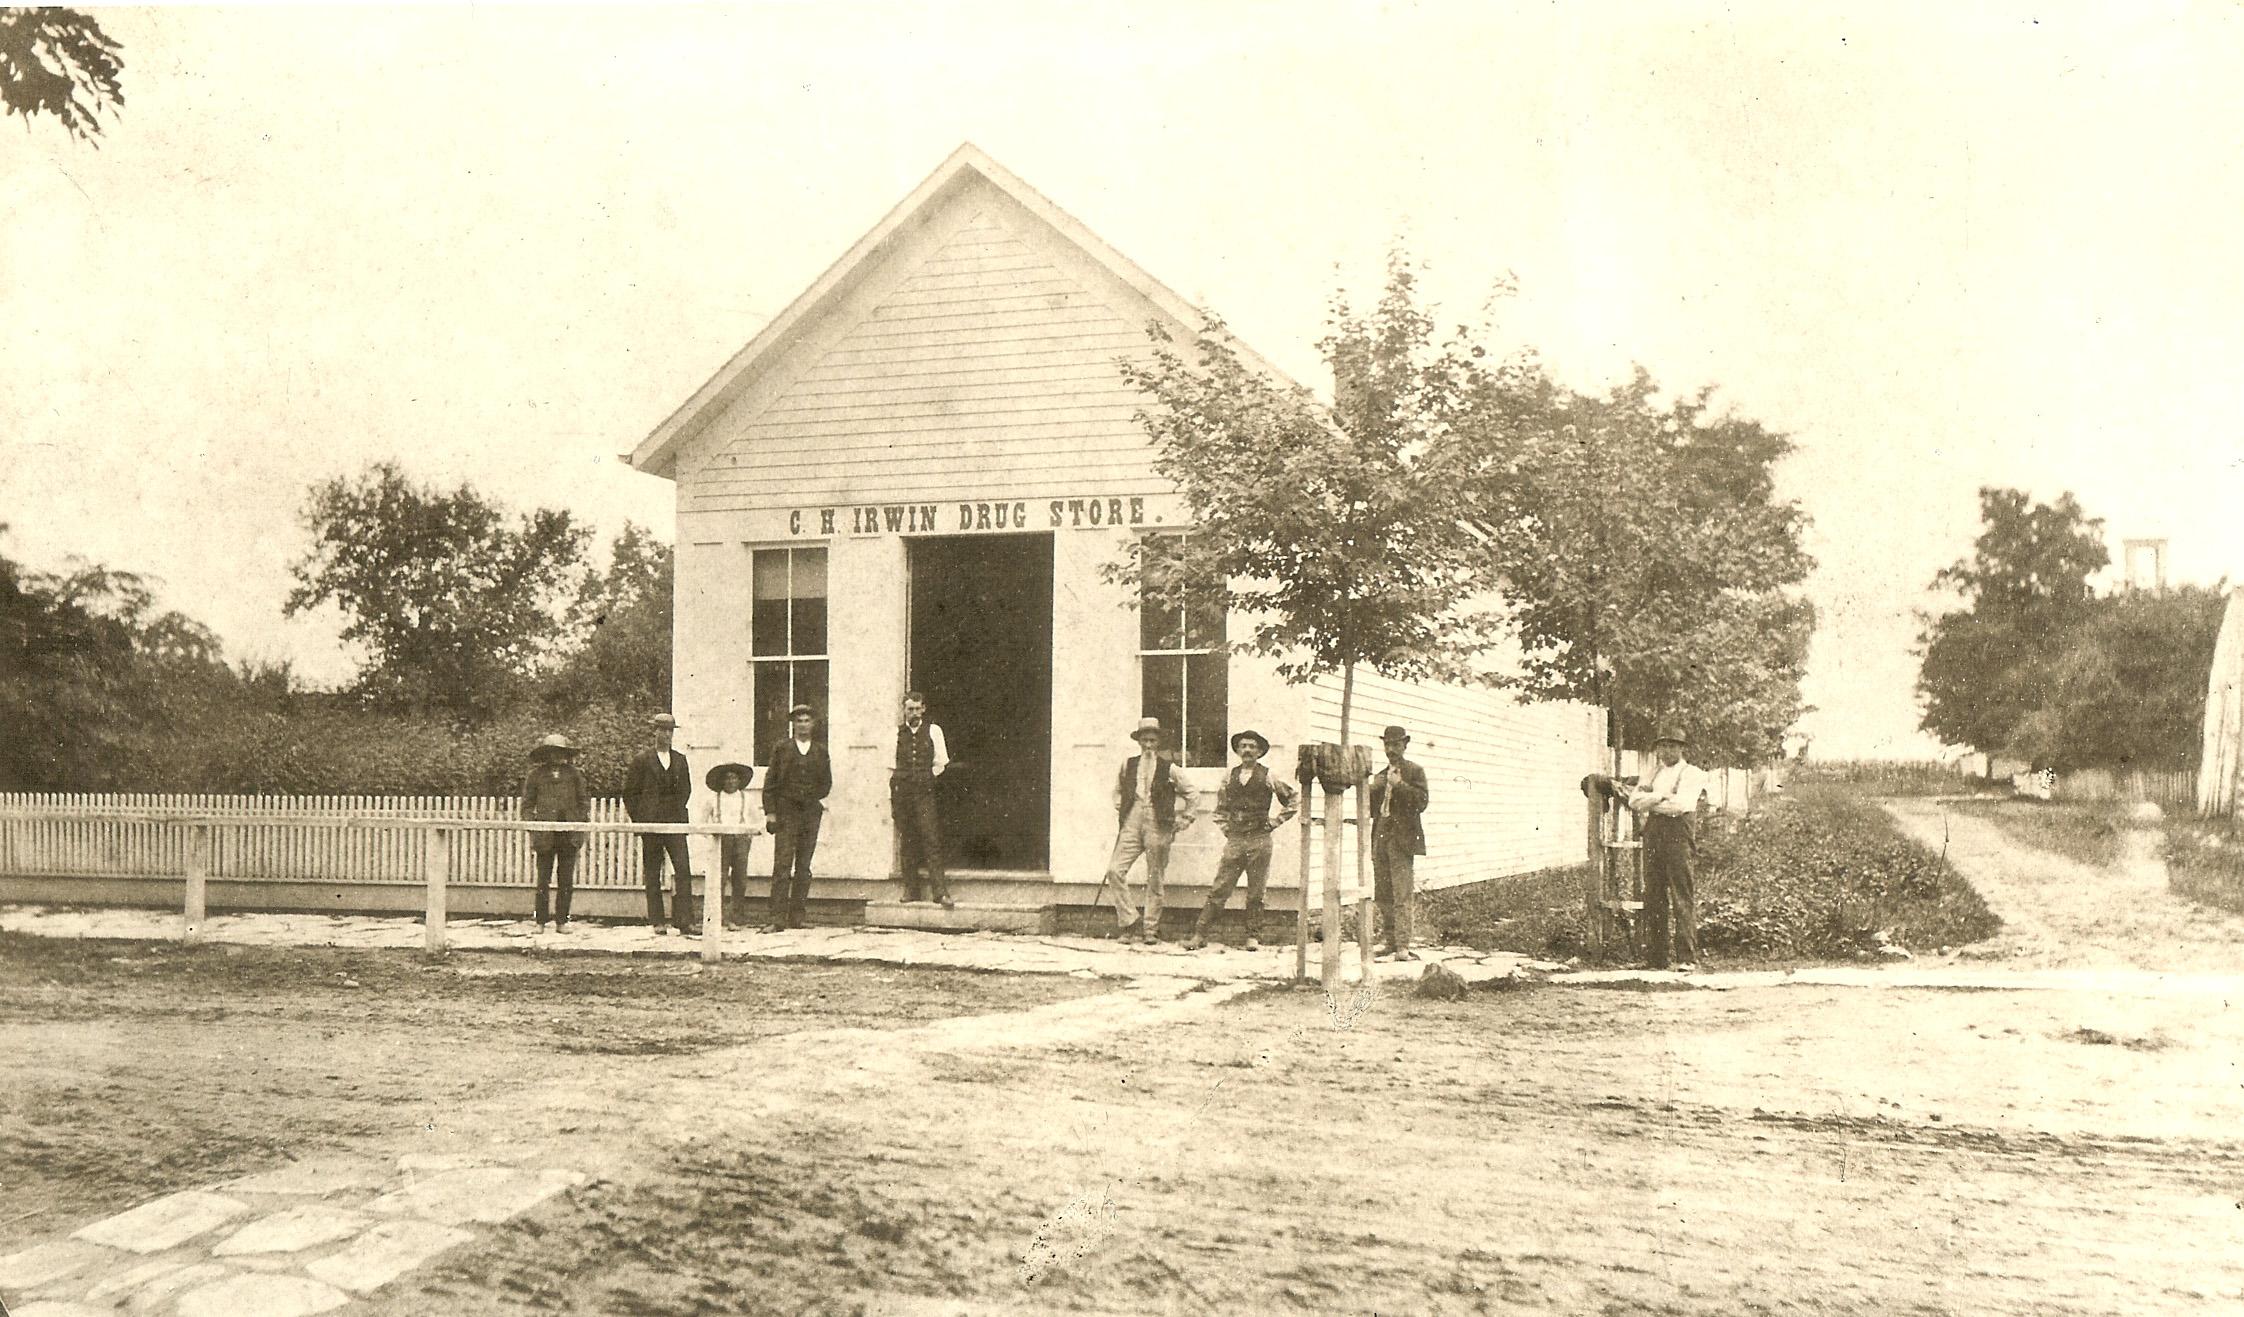 C.H. Irwin Drug Store, Martinsville, Ohio (c.1883–1884). Courtesy Clinton County Historical Society.